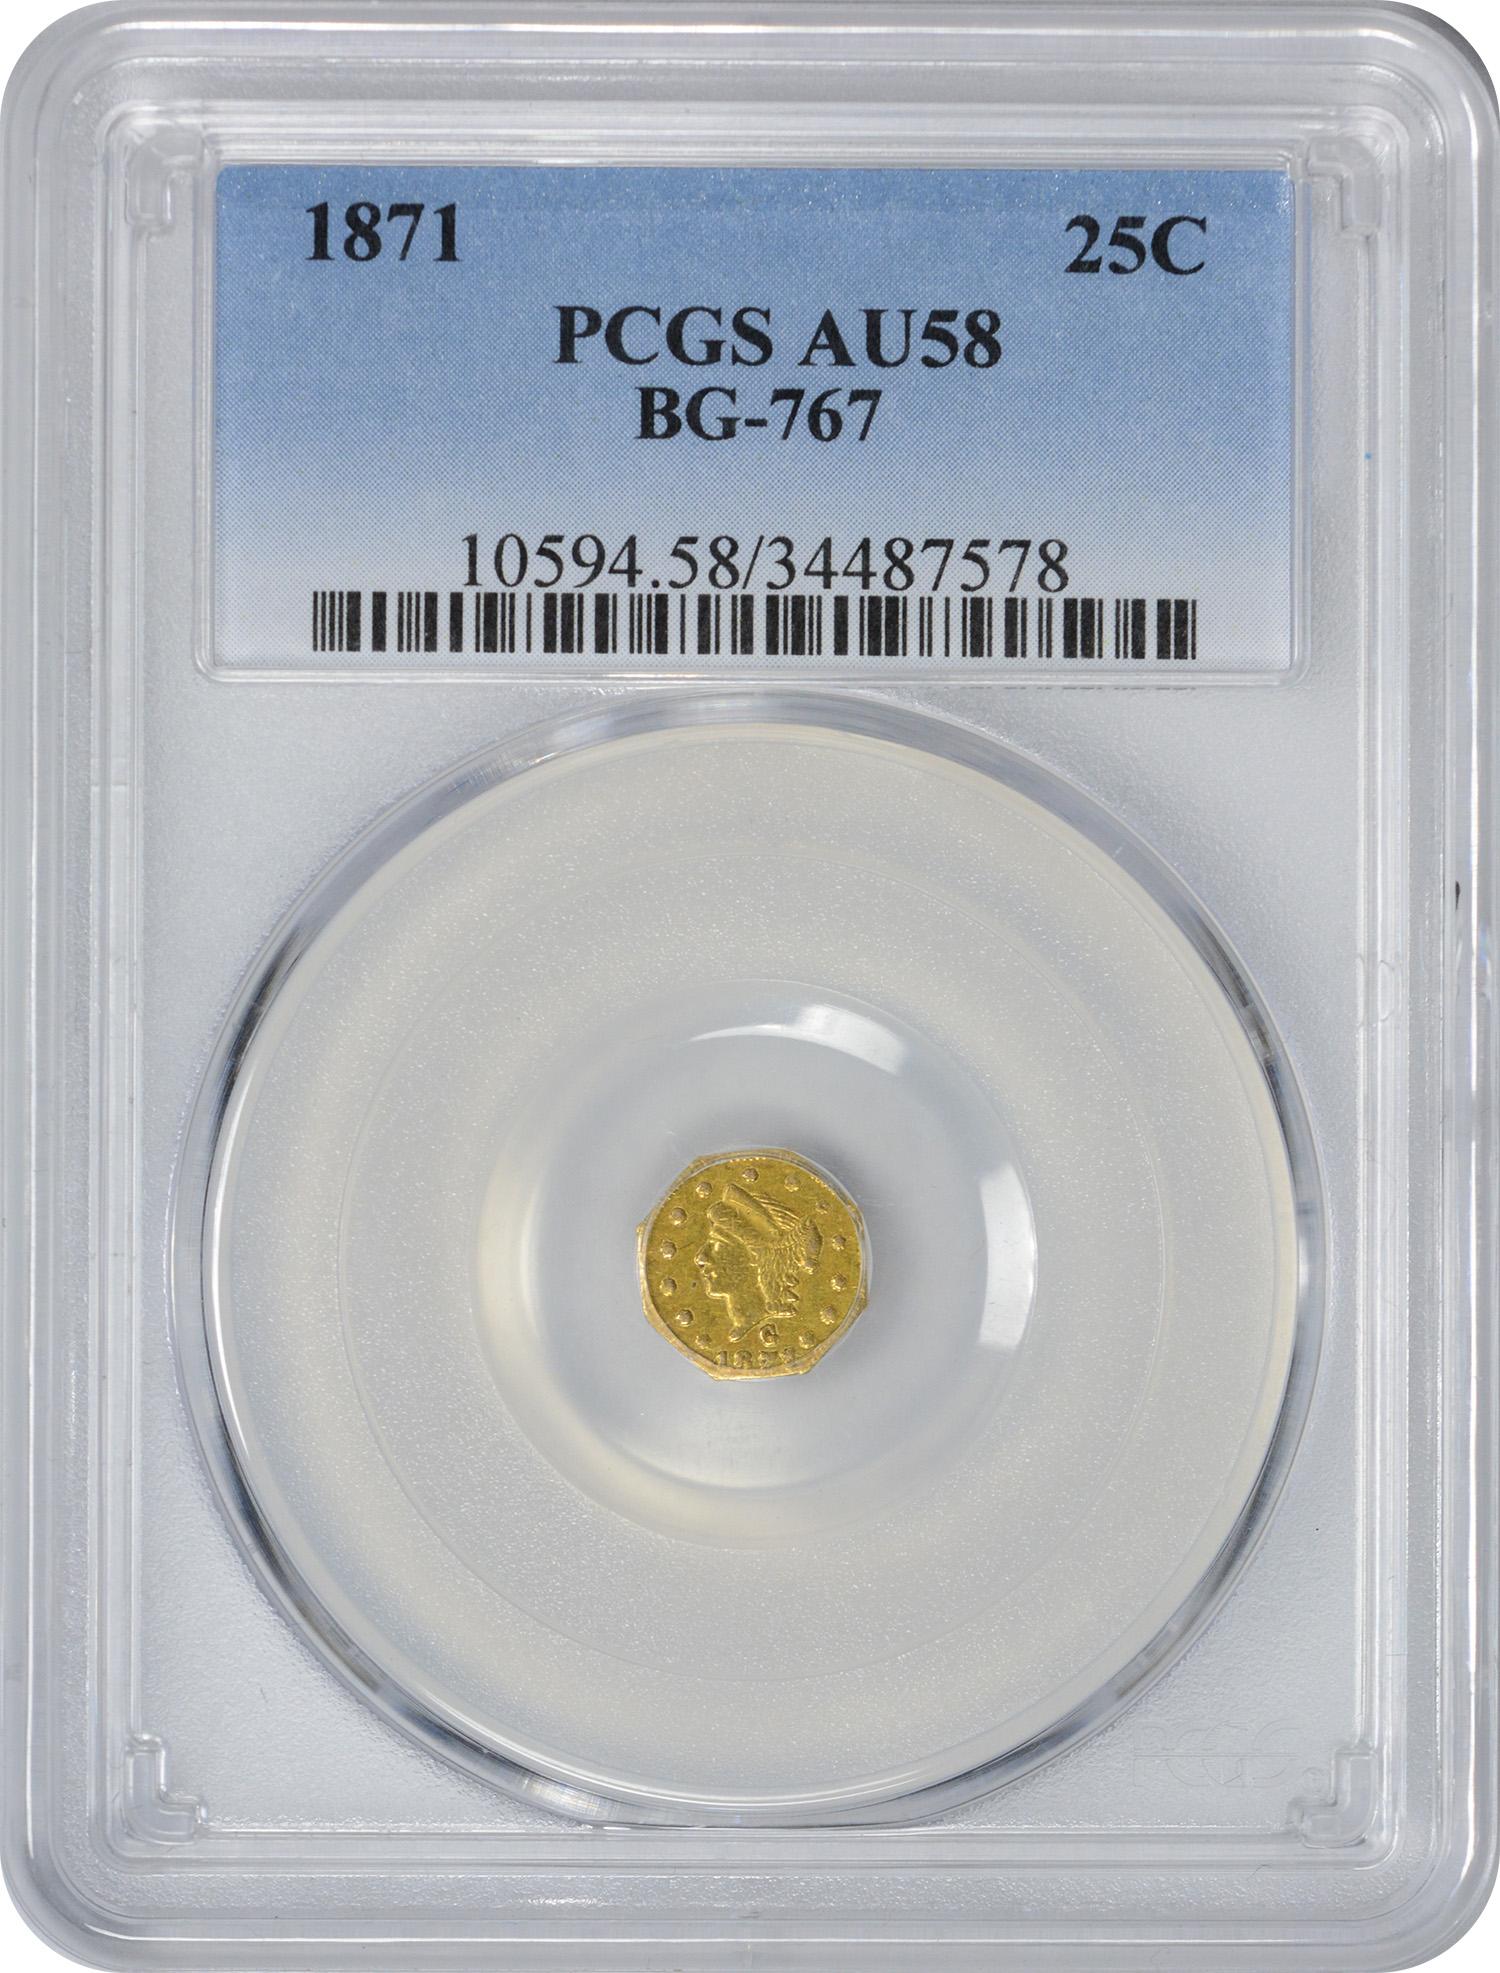 1871 Quarter Dollar California Gold, BG-767, AU58, PCGS